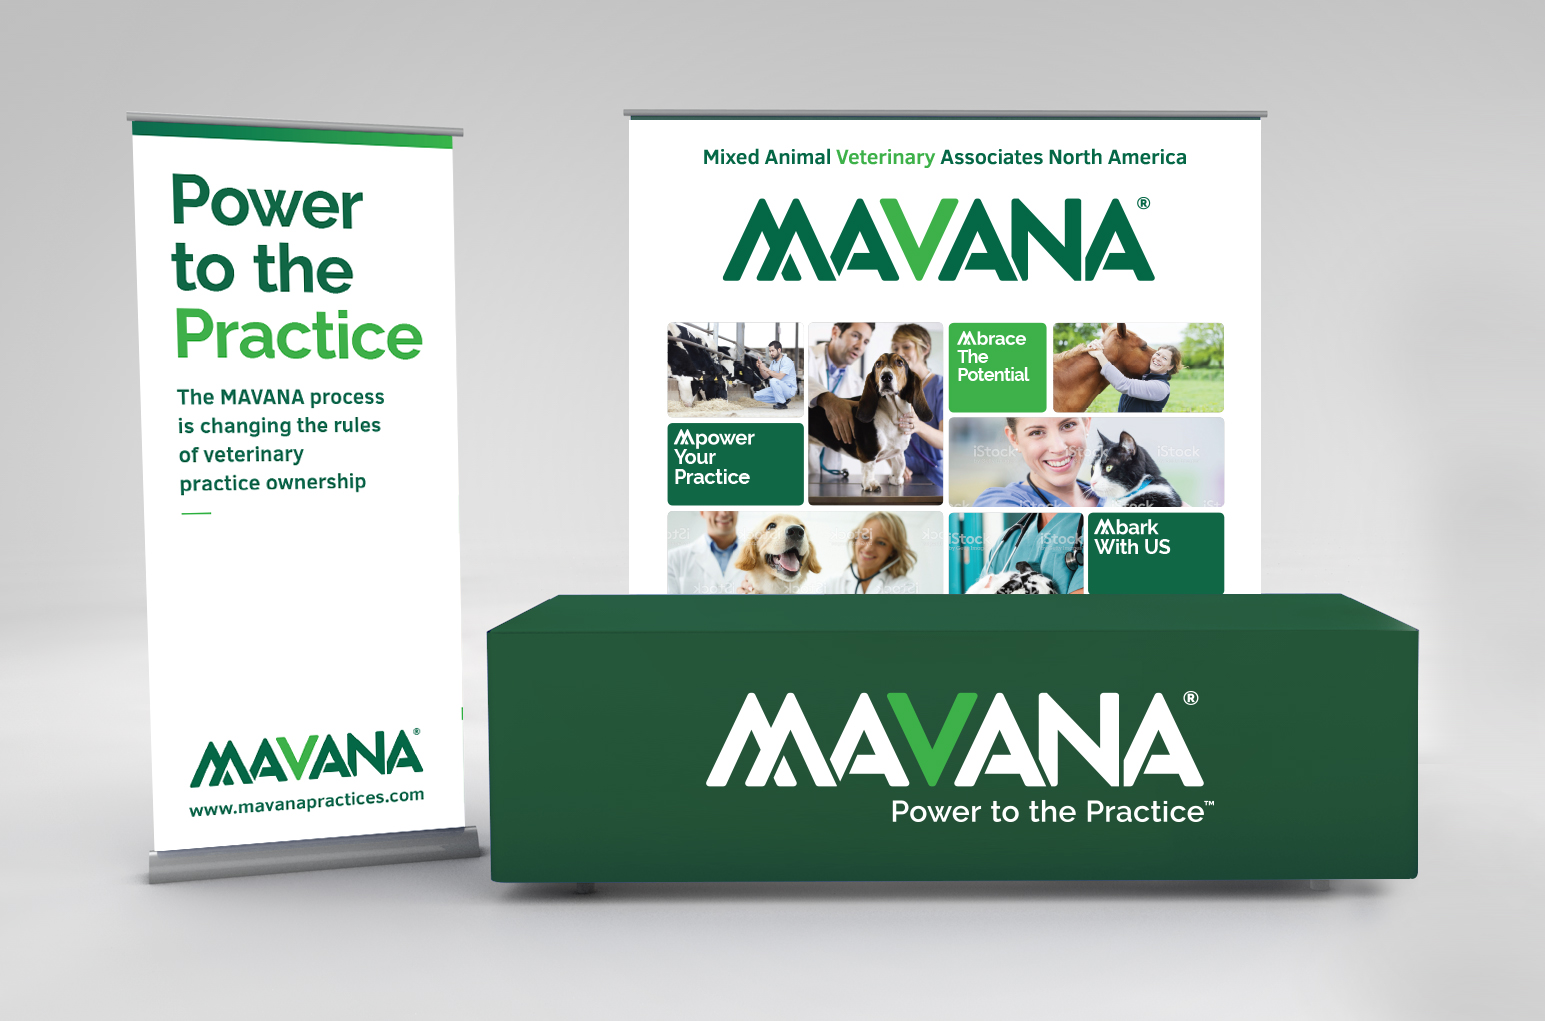 MAVANA_Booth_View1_08